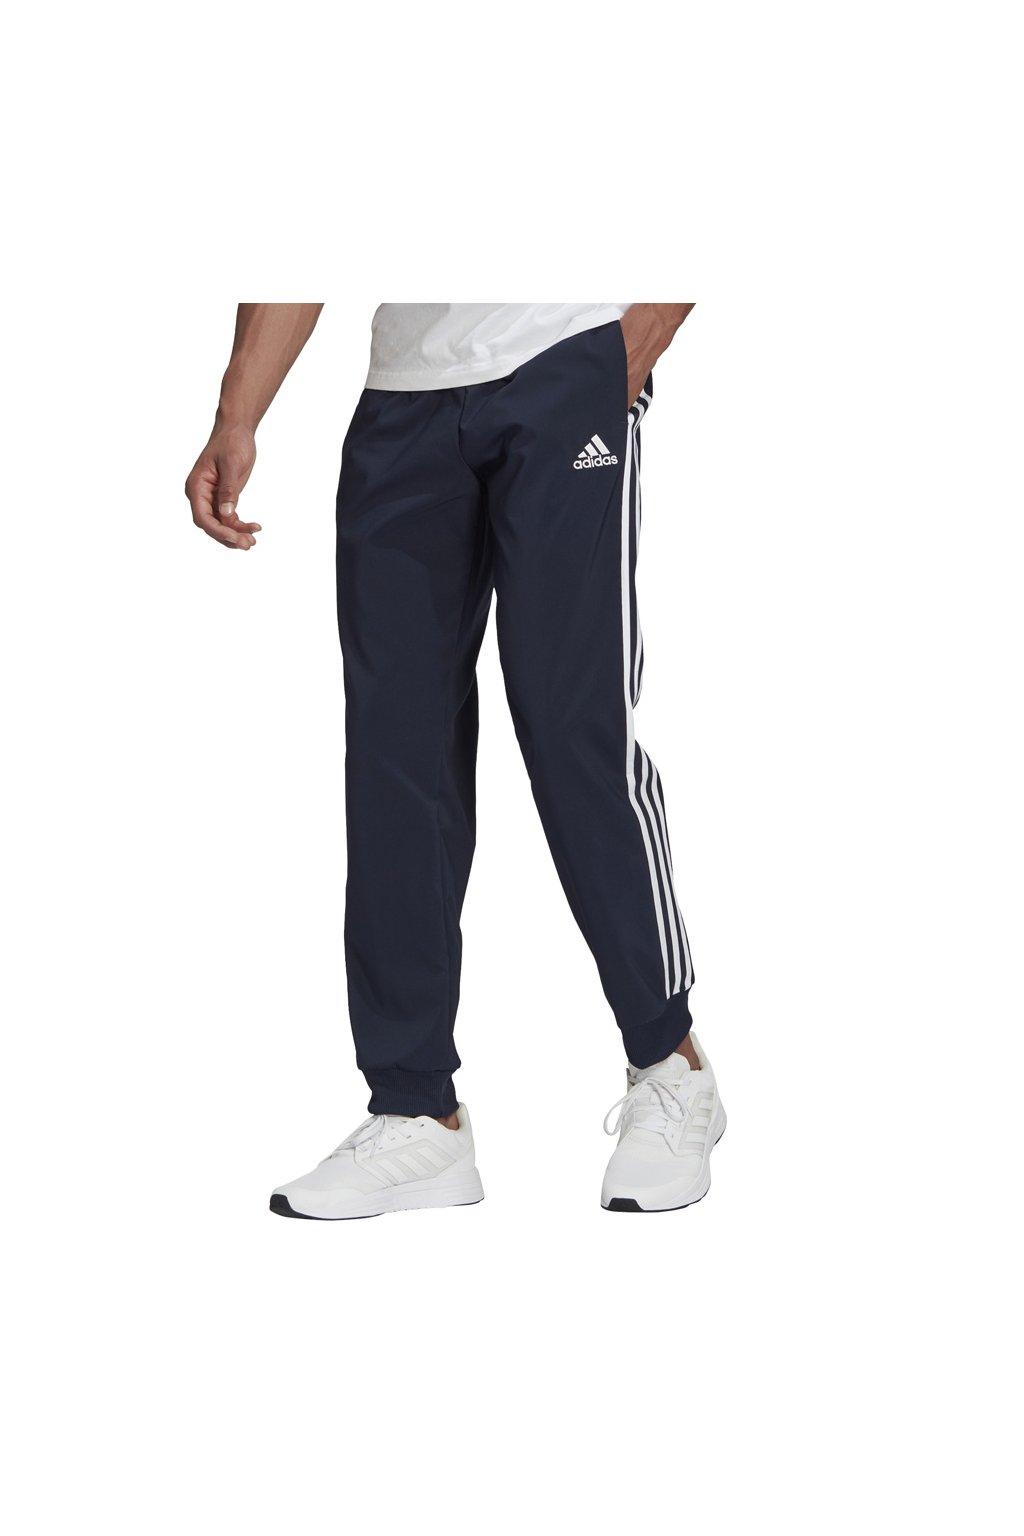 Pánske nohavice adidas Essentials Tapered Cuff 3 Stripes Pants tmavomodré GK8981